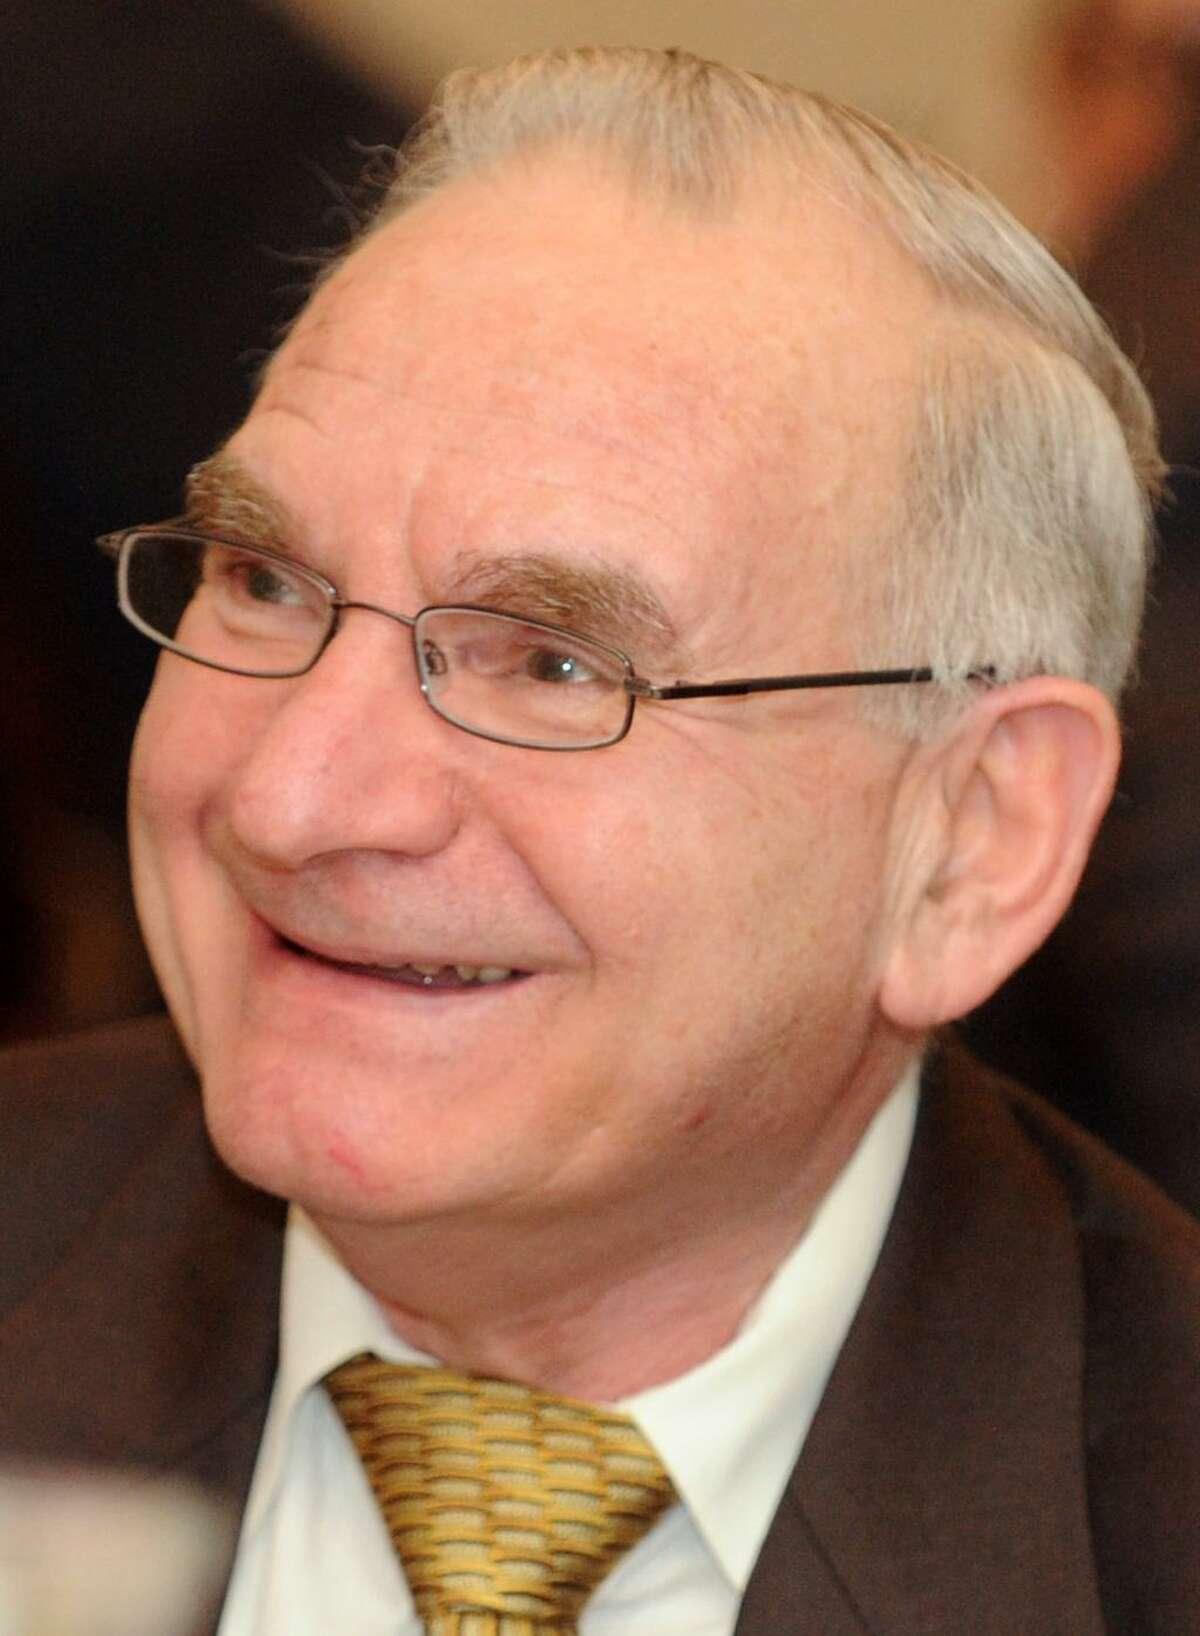 Mario Testa, Democratic Town Chairman